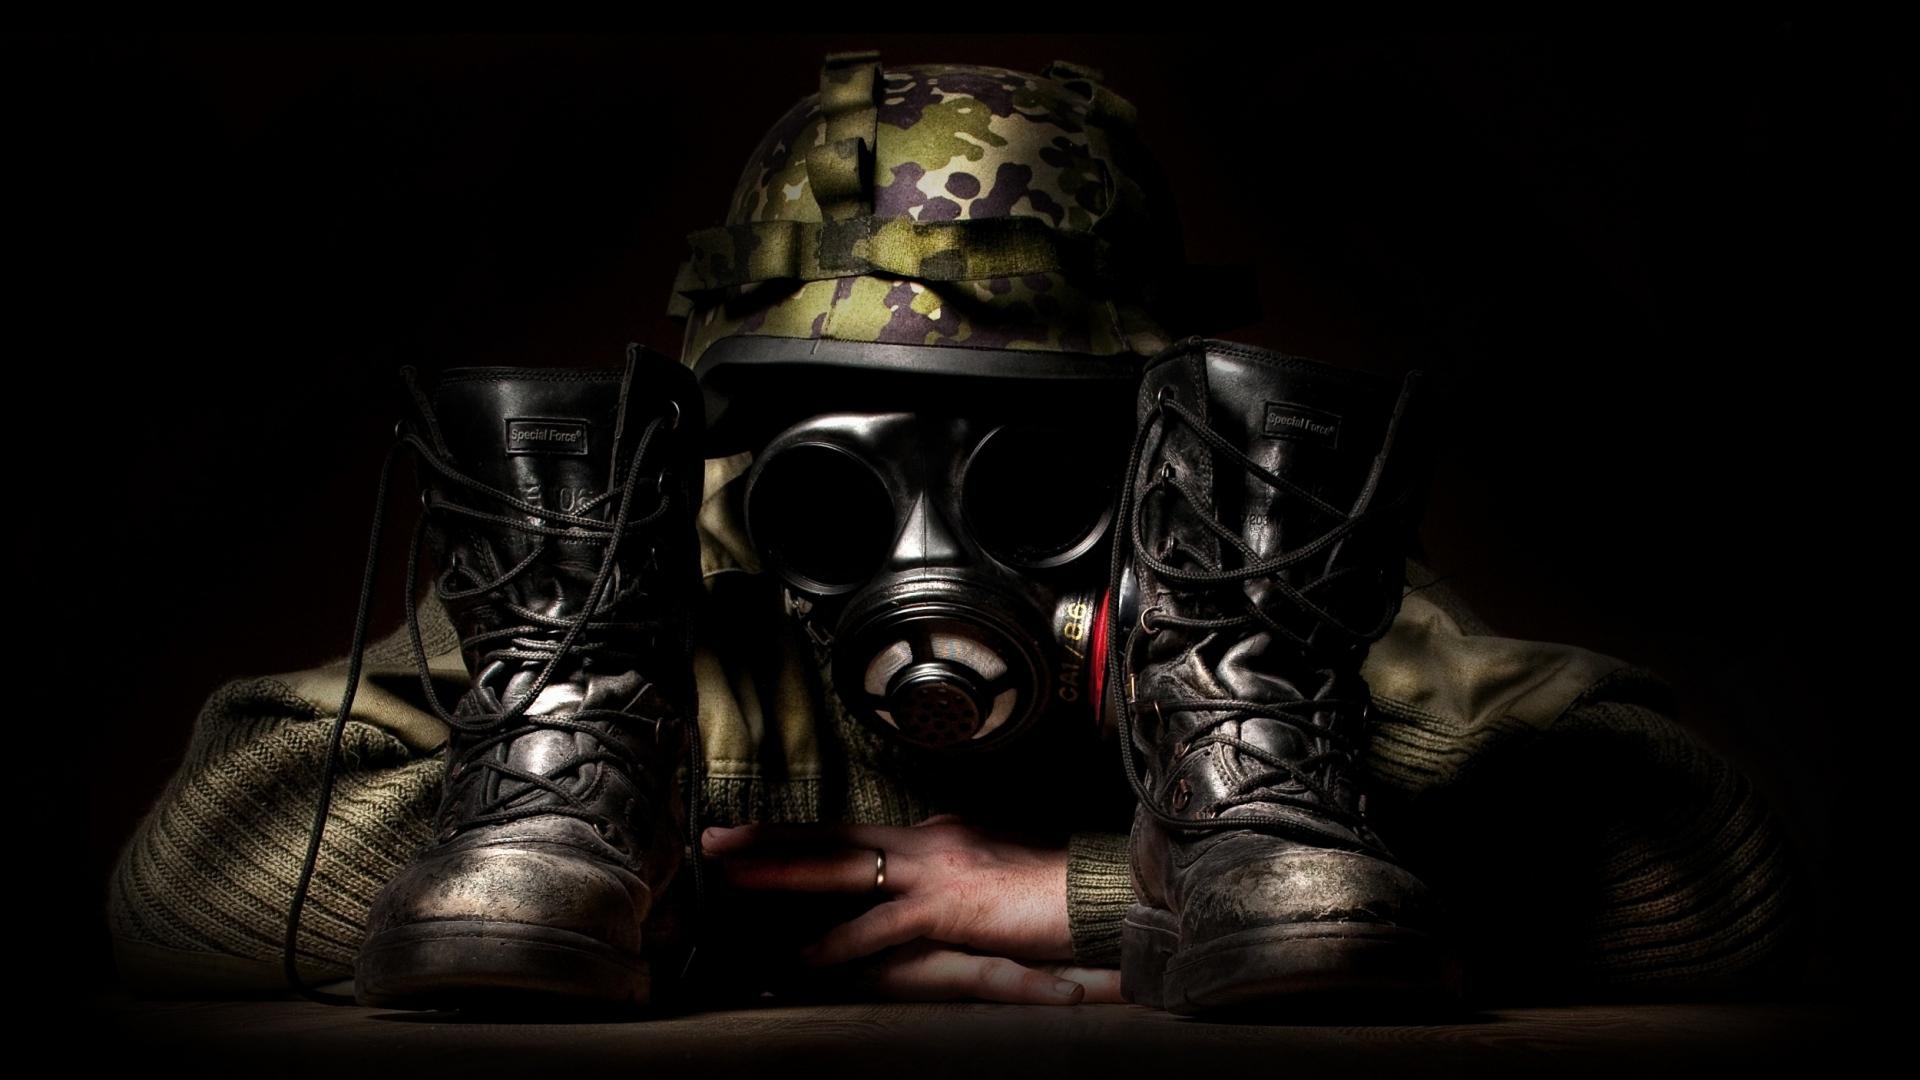 indian army logo 3d wallpaper